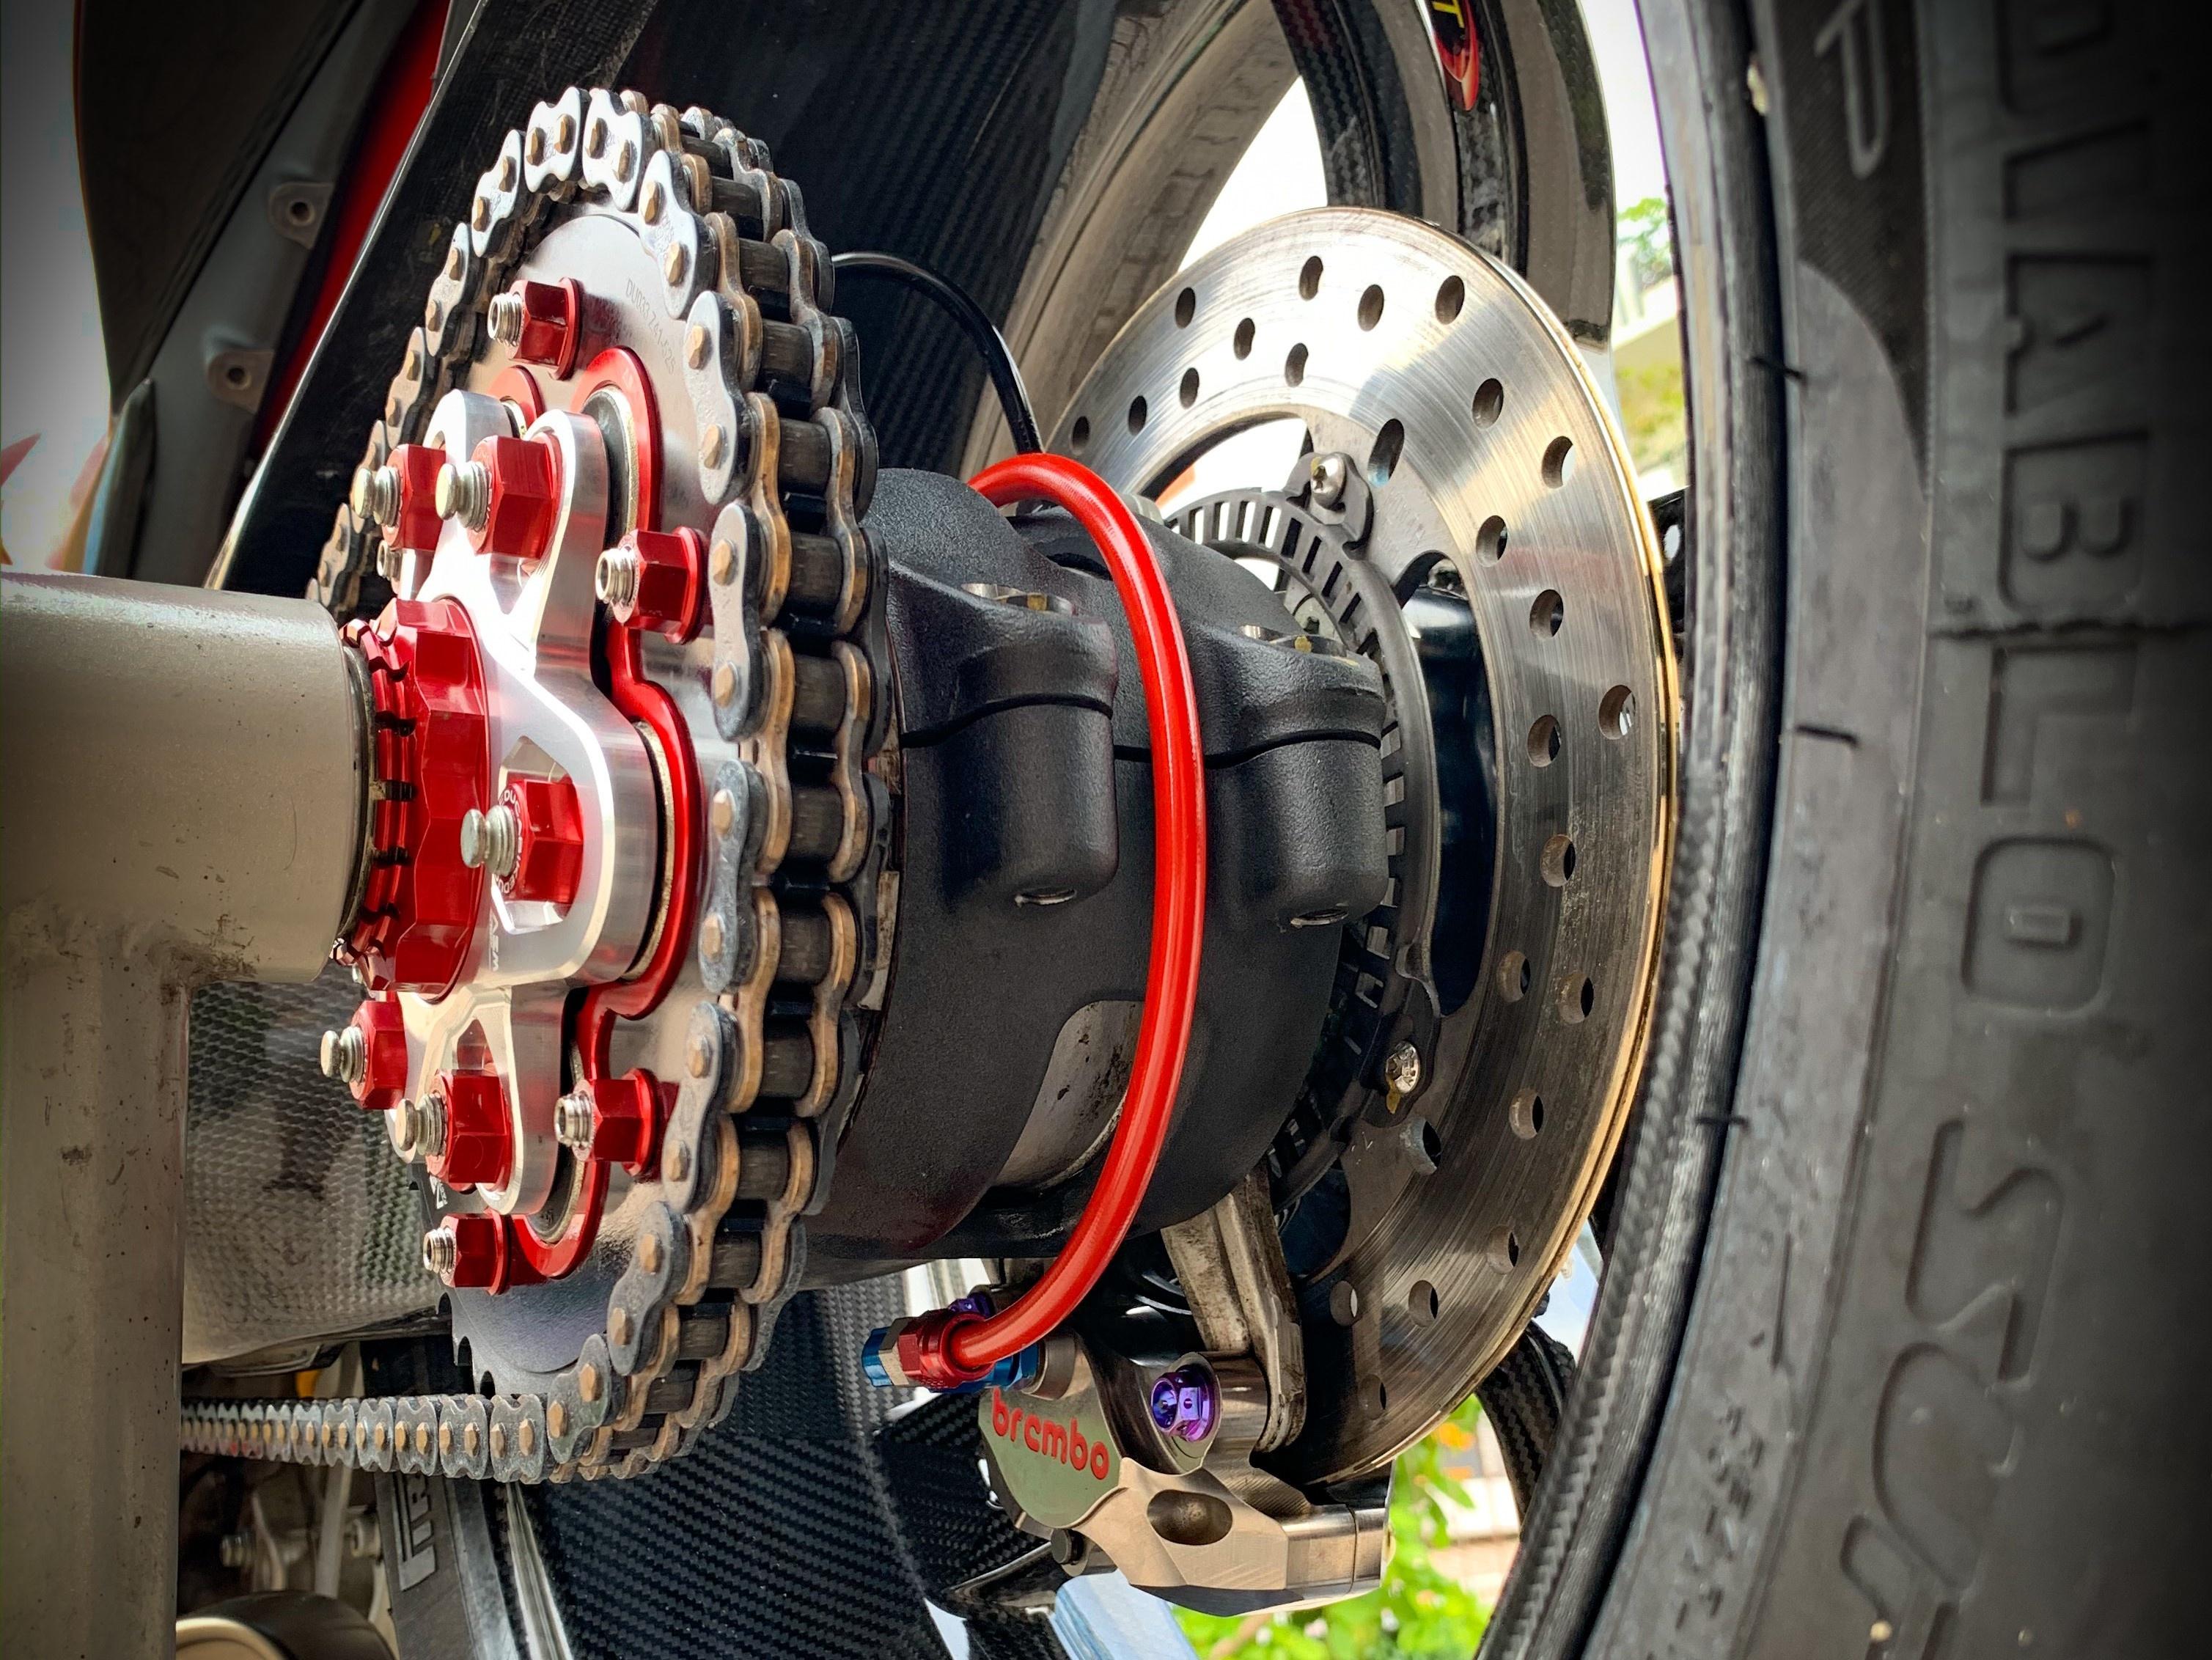 Moto tien ty Ducati Panigale V4 S voi goi do dat gia tai TP.HCM hinh anh 16 V4_22.jpeg